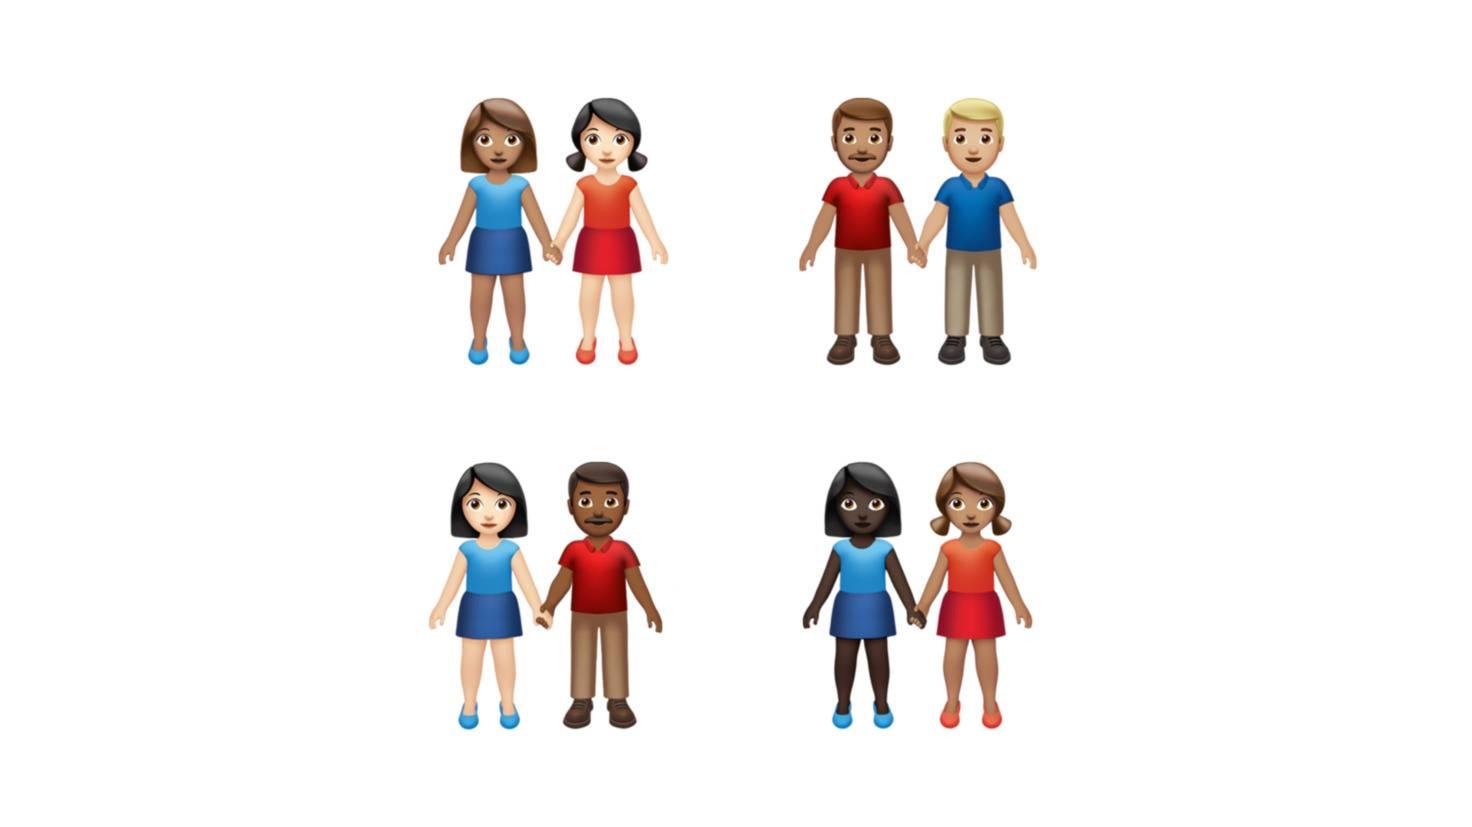 apple-emojis-2019-inklusion